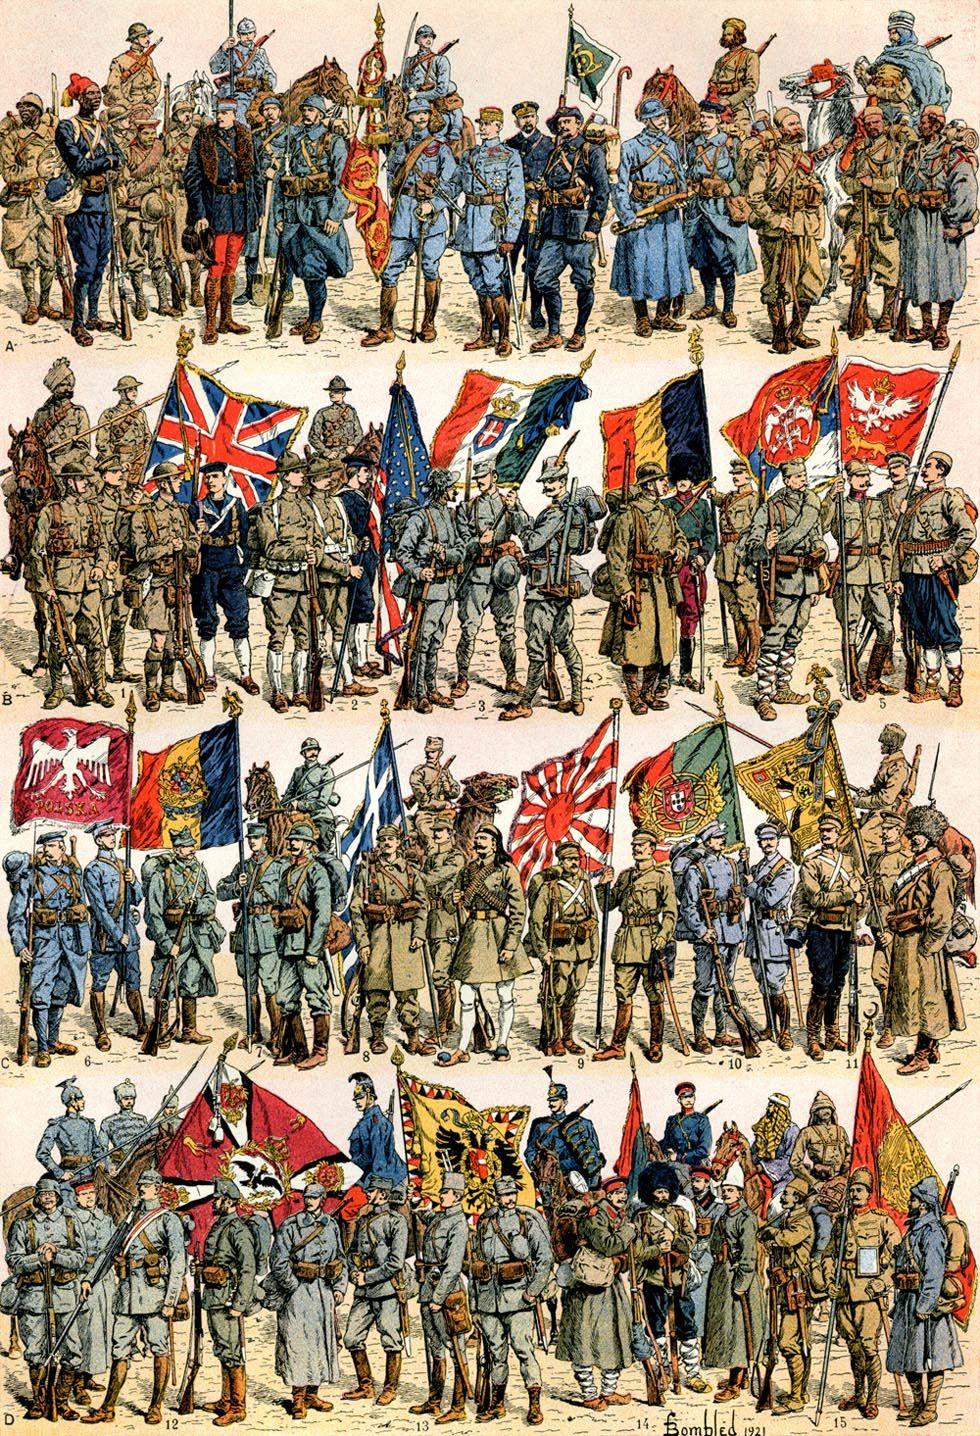 Uniformes Grande Guerre Jpg 980 1 436 Pixels Dessin Militaire Guerre La Grande Guerre